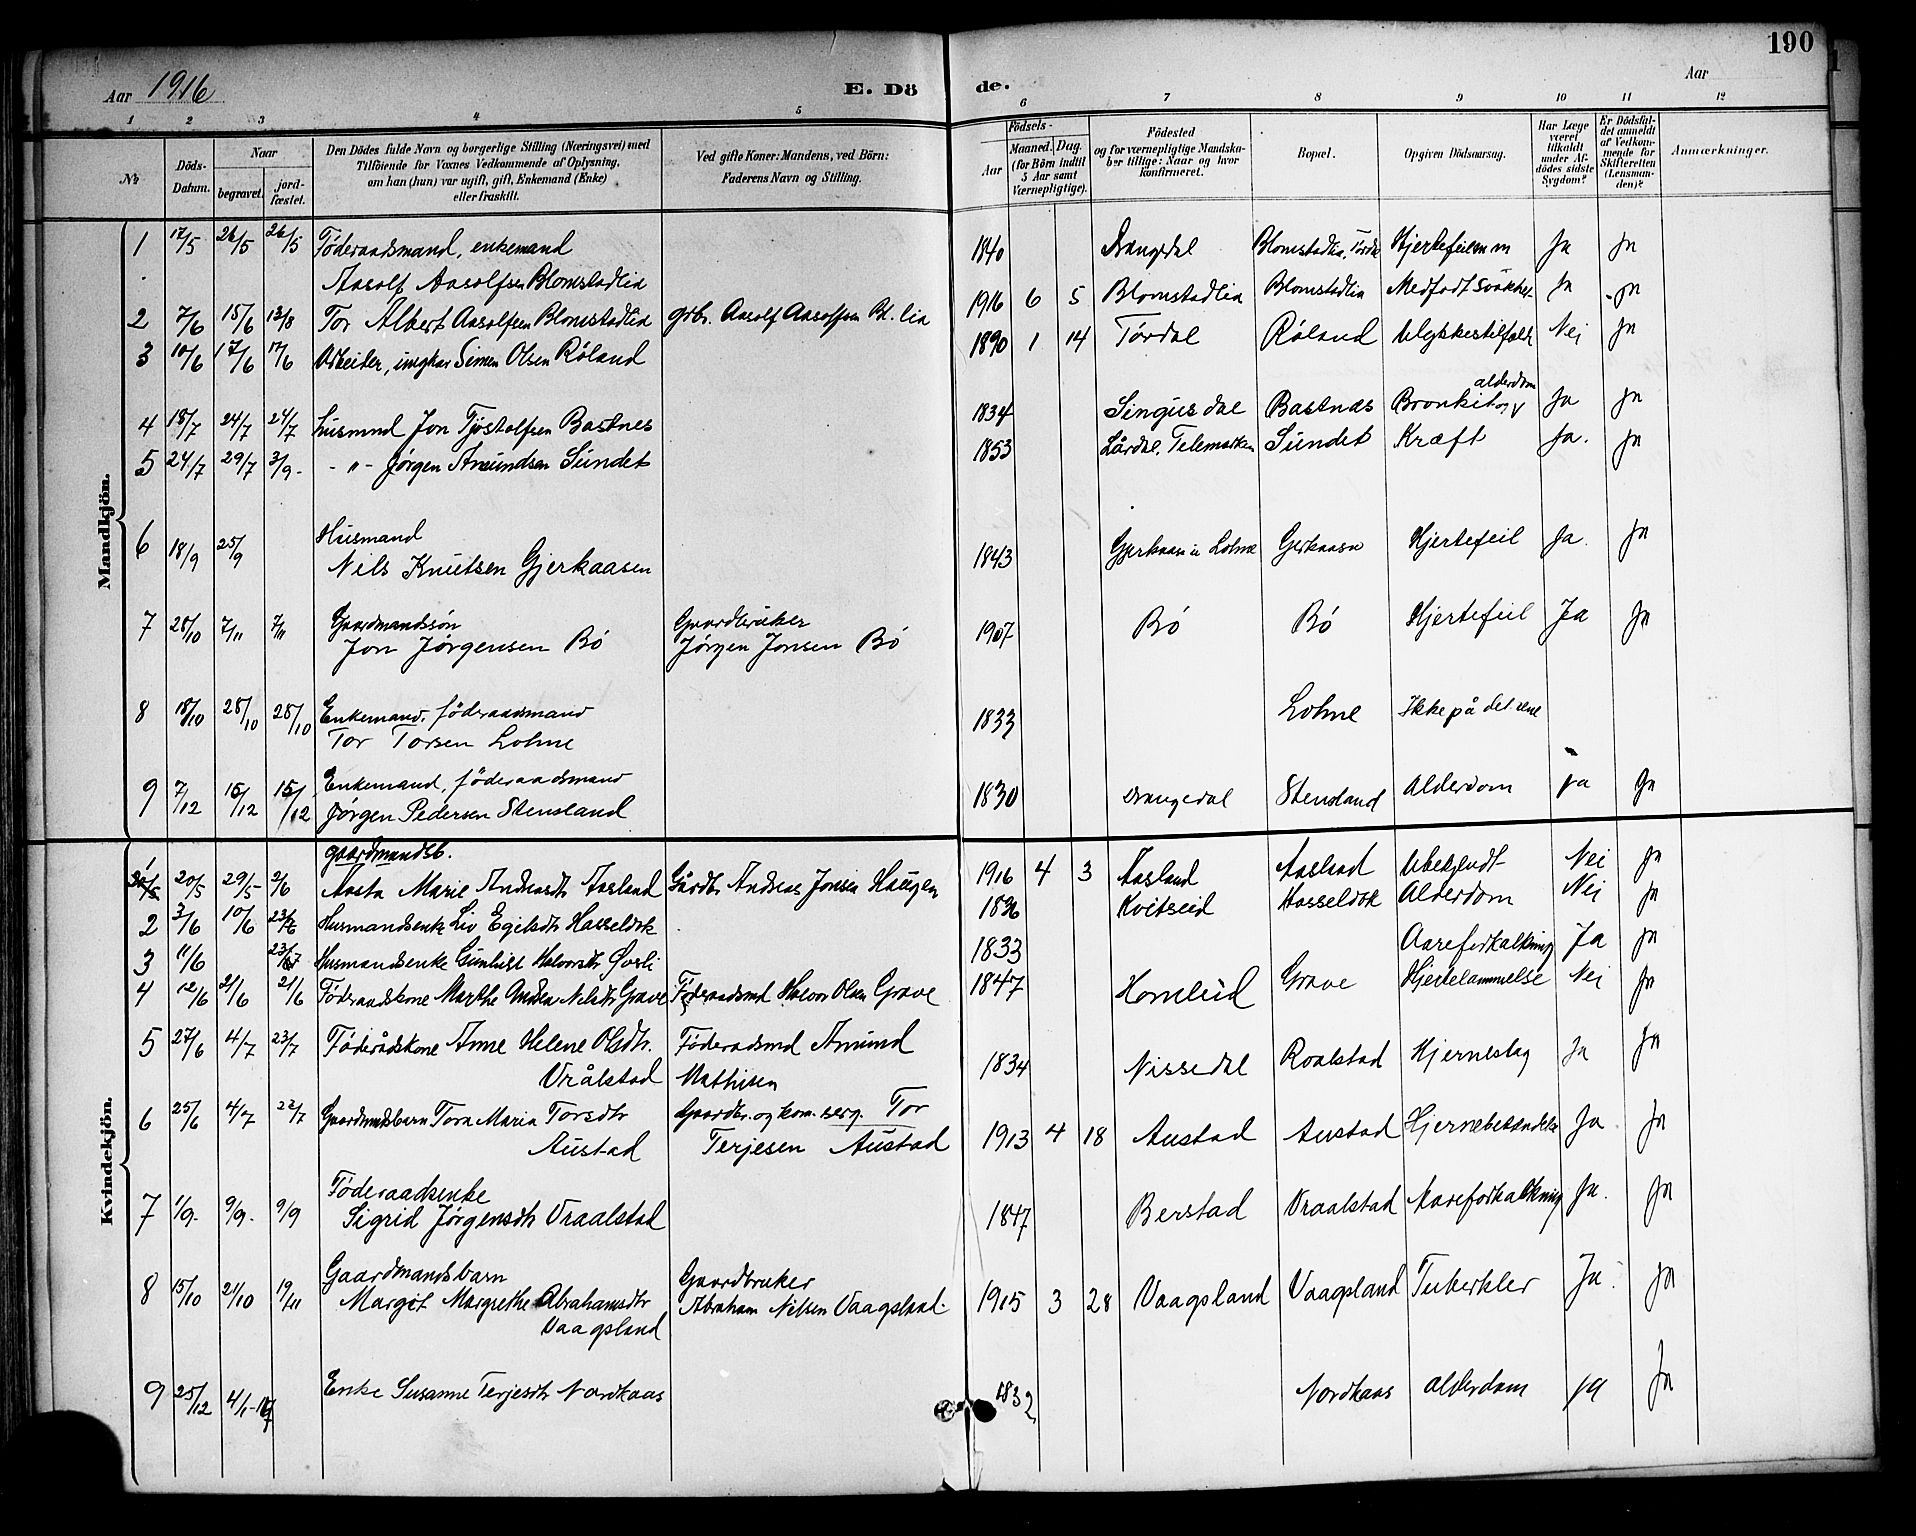 SAKO, Drangedal kirkebøker, G/Gb/L0002: Klokkerbok nr. II 2, 1895-1918, s. 190